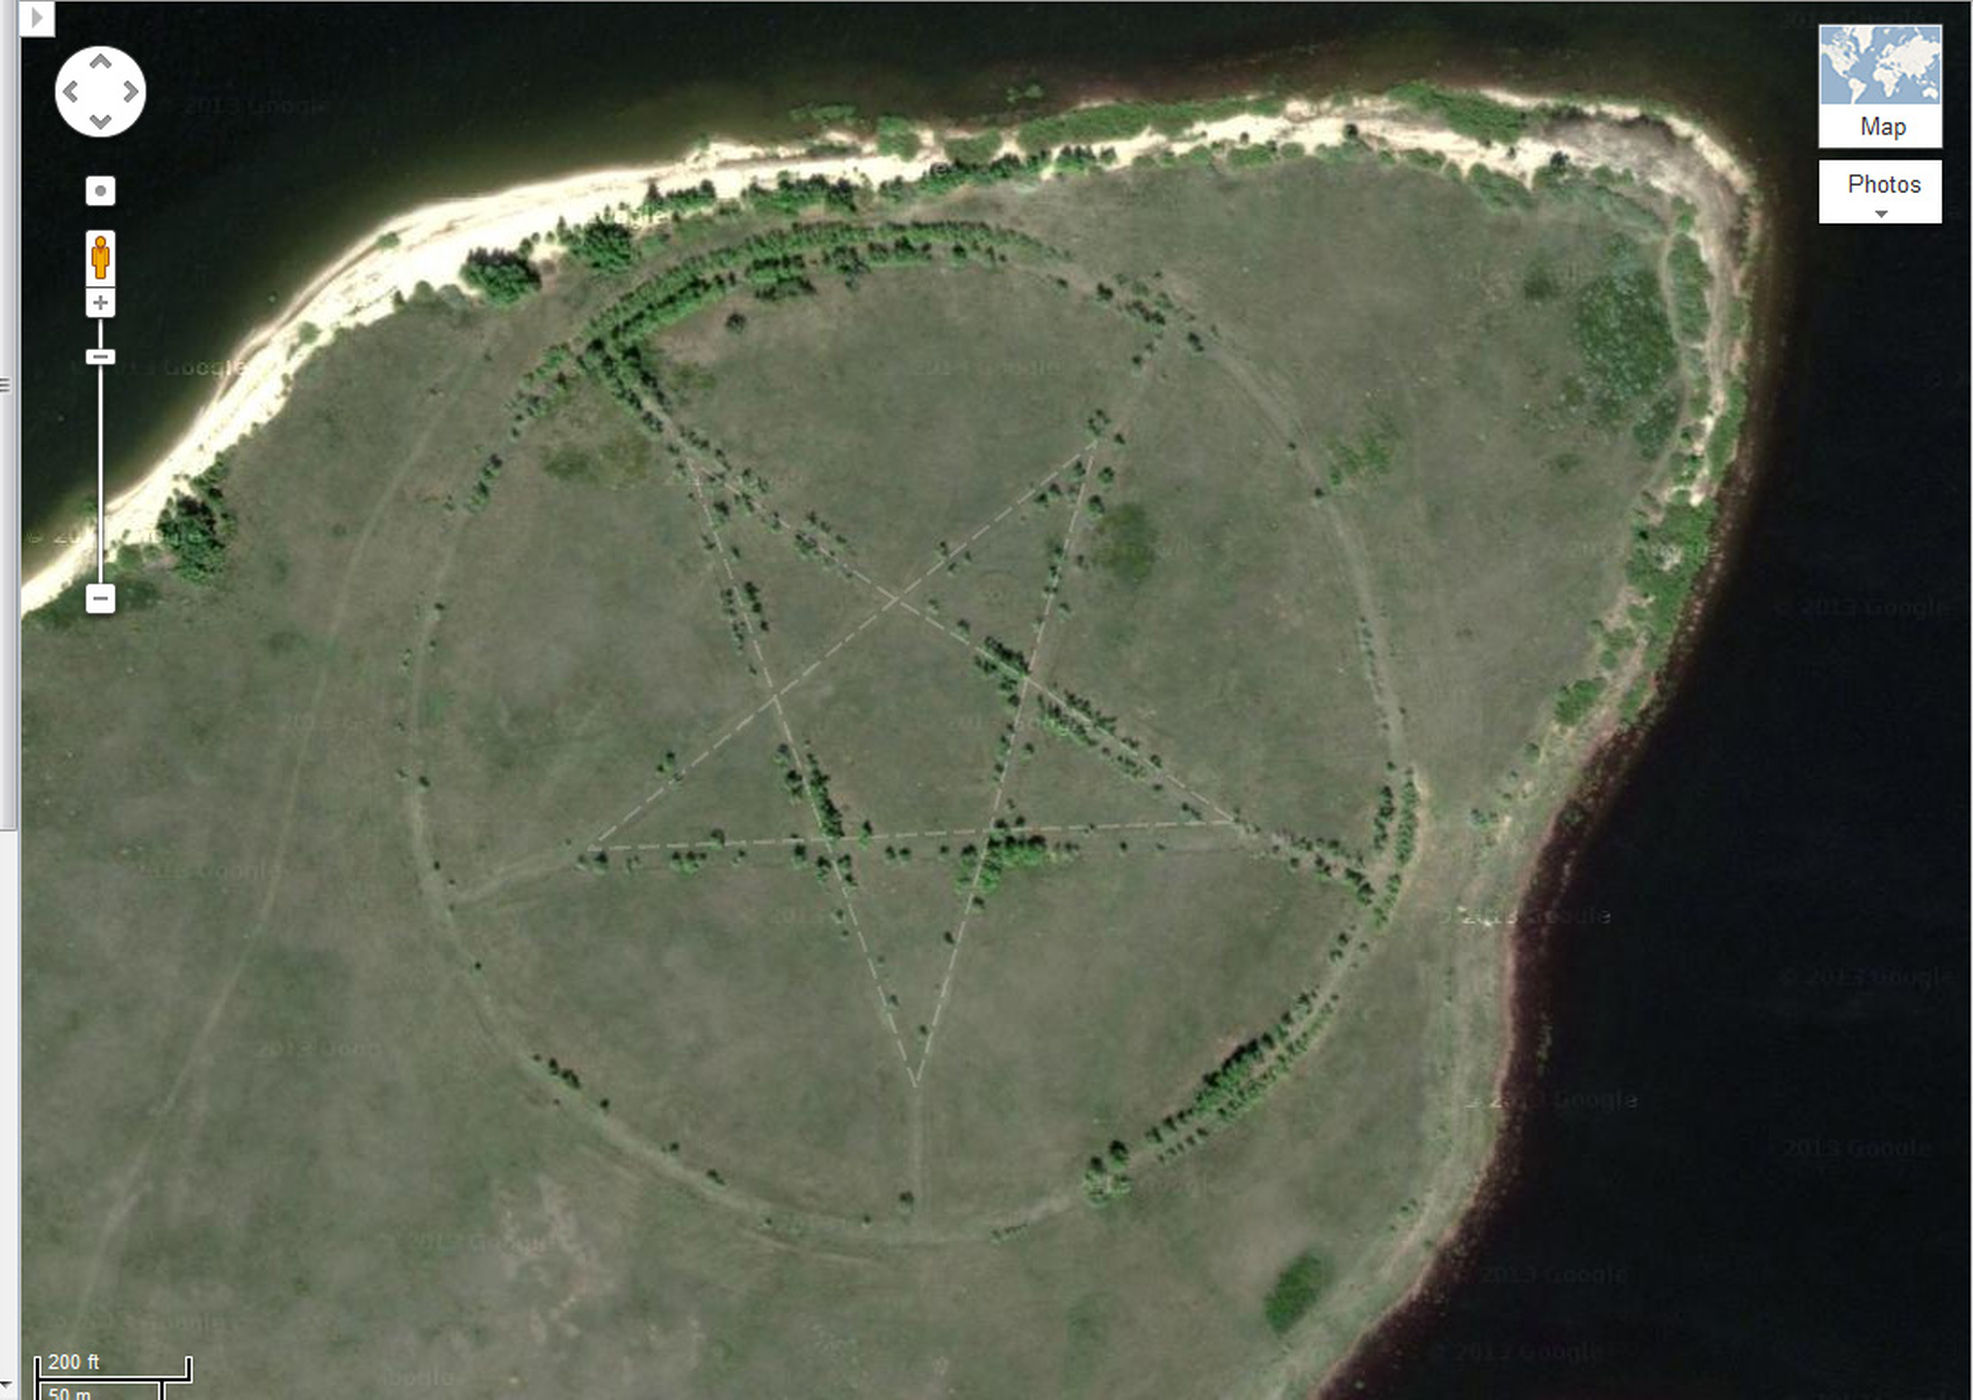 lucruri inexplicabile Google Earth - pentagrama